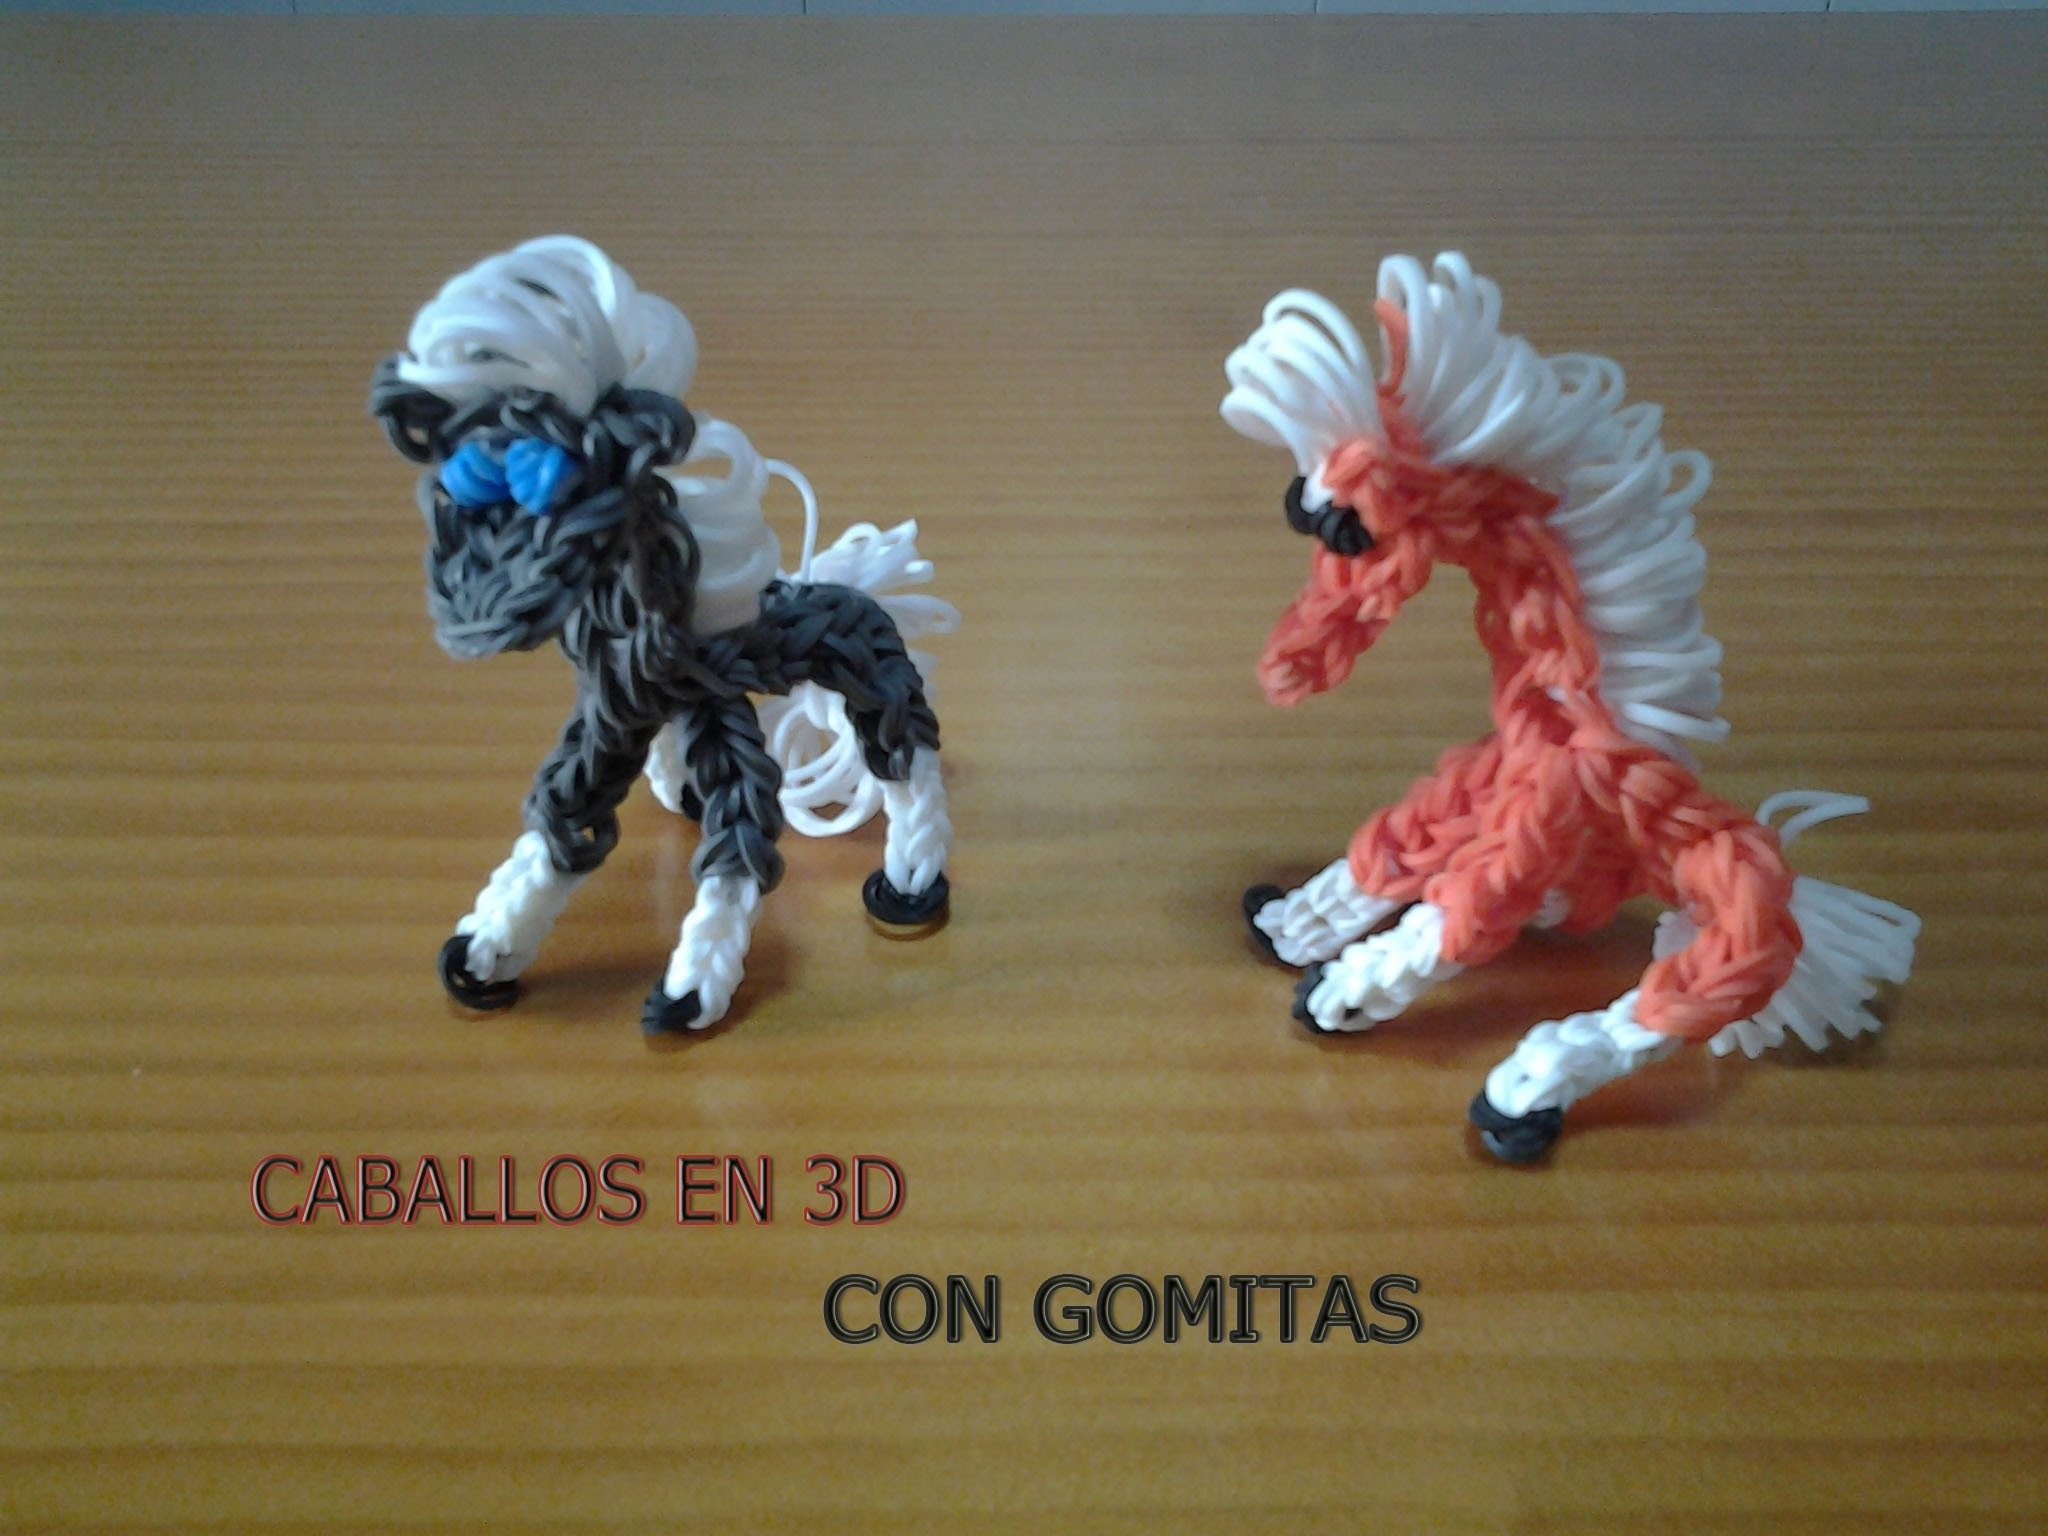 COMO HACER UN CABALLO EN 3D CON GOMITAS (LIGAS) CON TELAR.